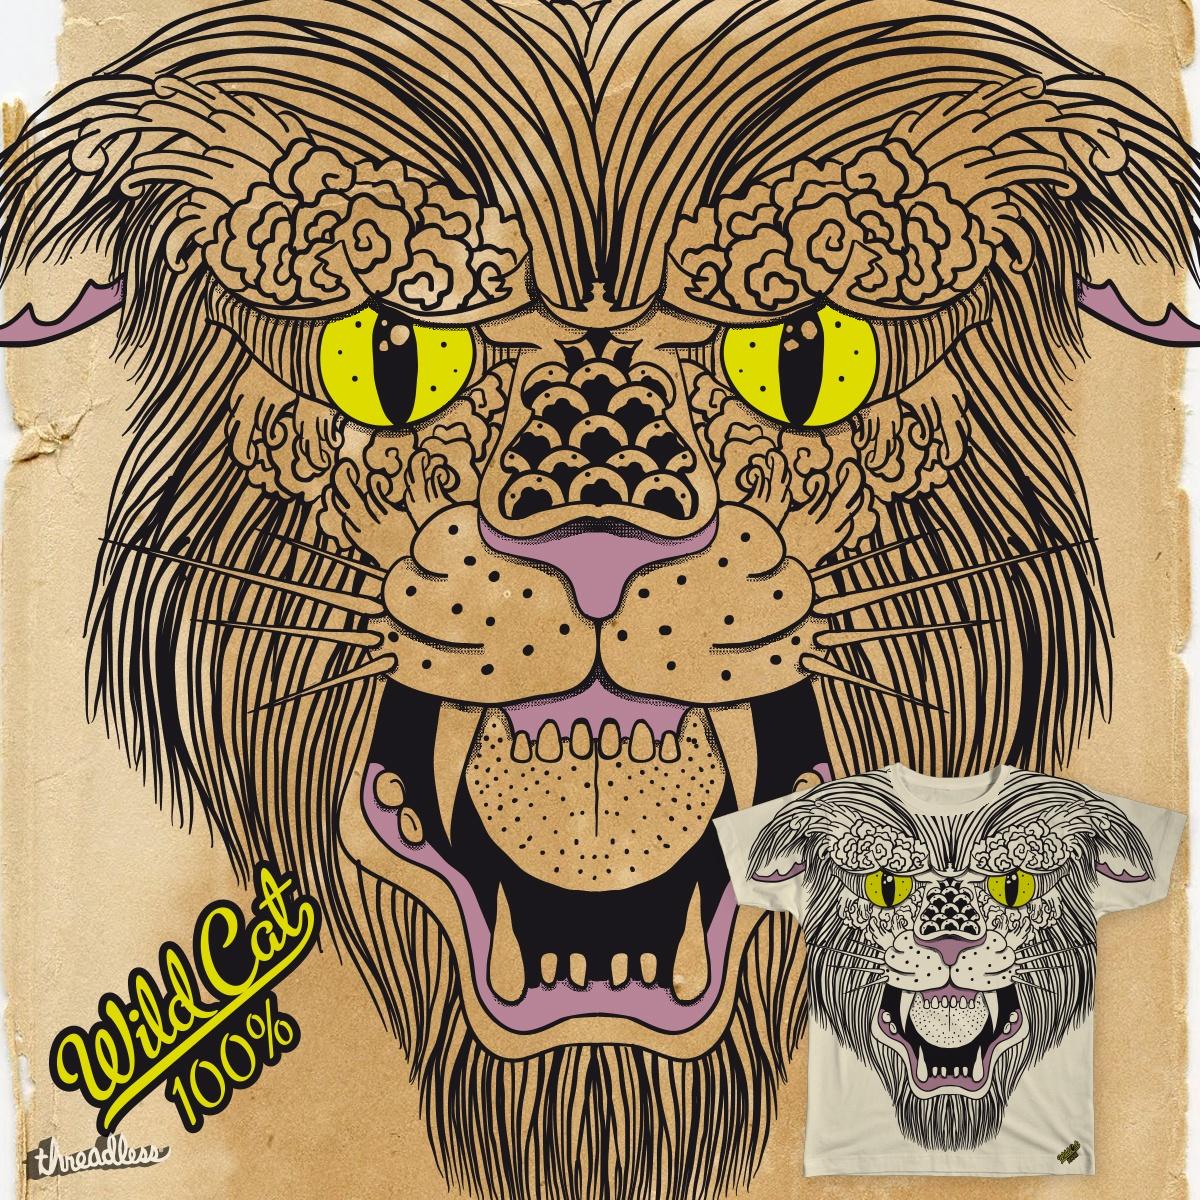 Wild Cat 100% by dada1987 on Threadless